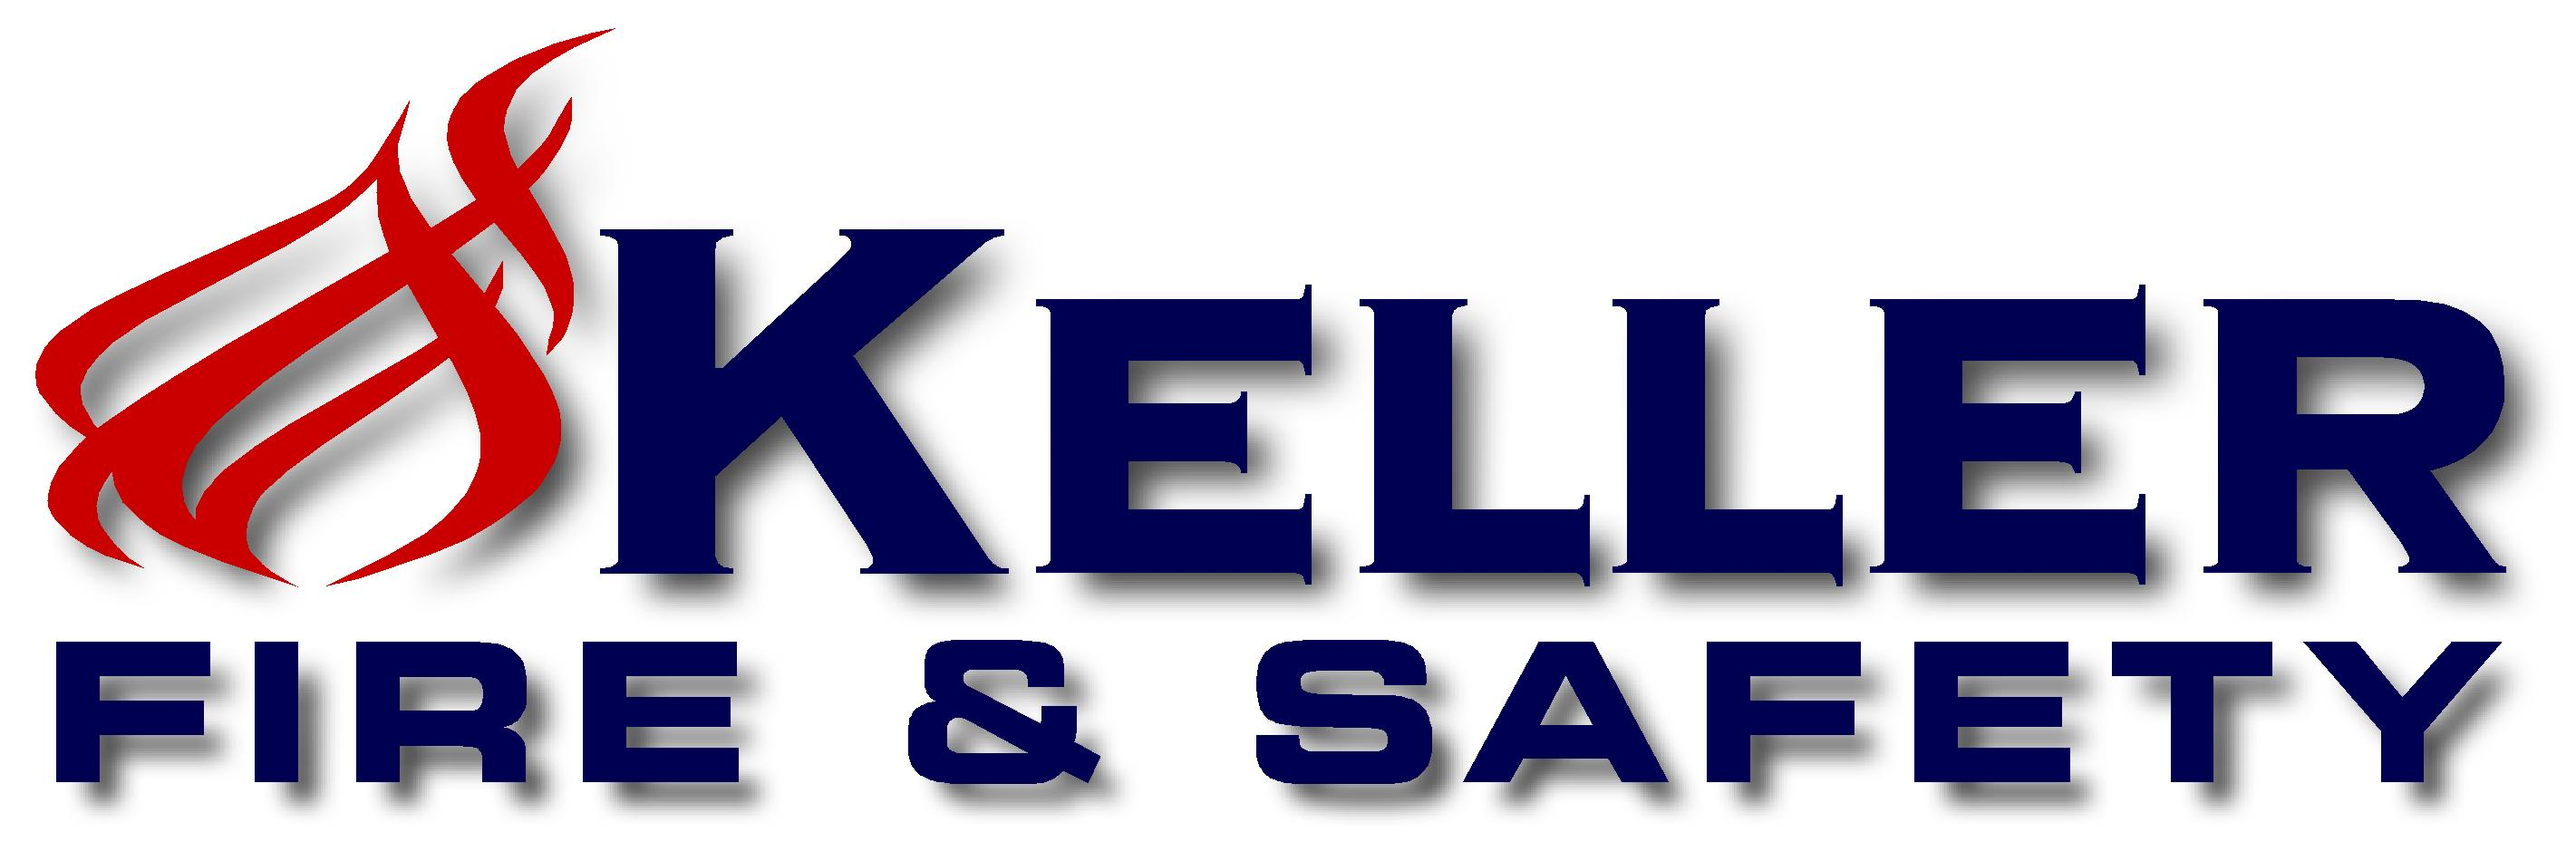 Keller_logo.jpg